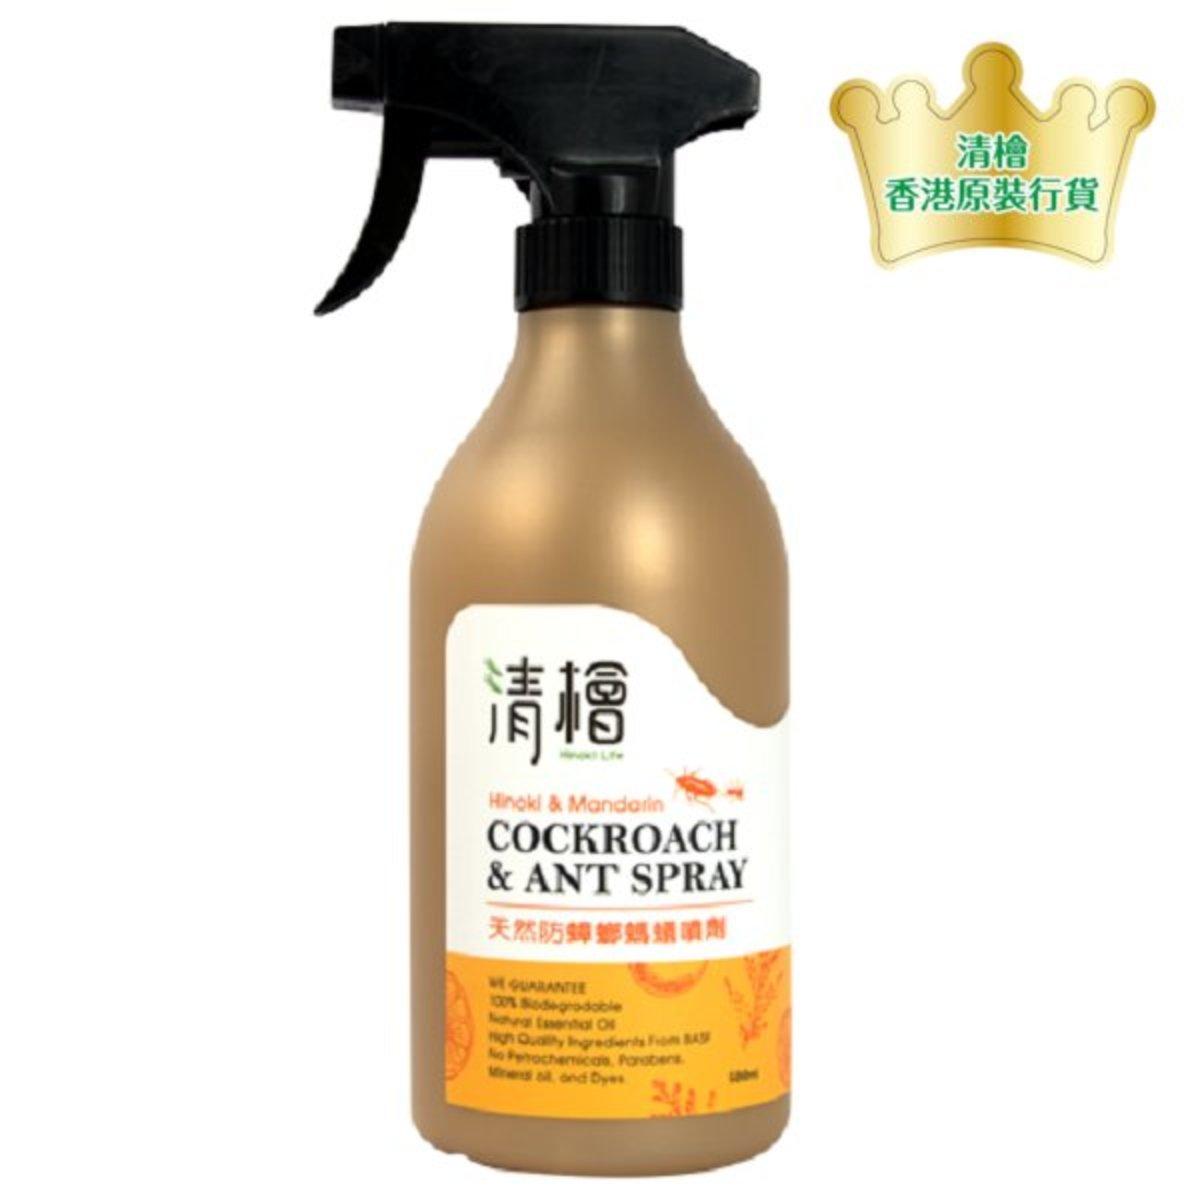 Natural Anti-mite Ant Spray 500ML SGS certificatio [Hong Kong original licensed]